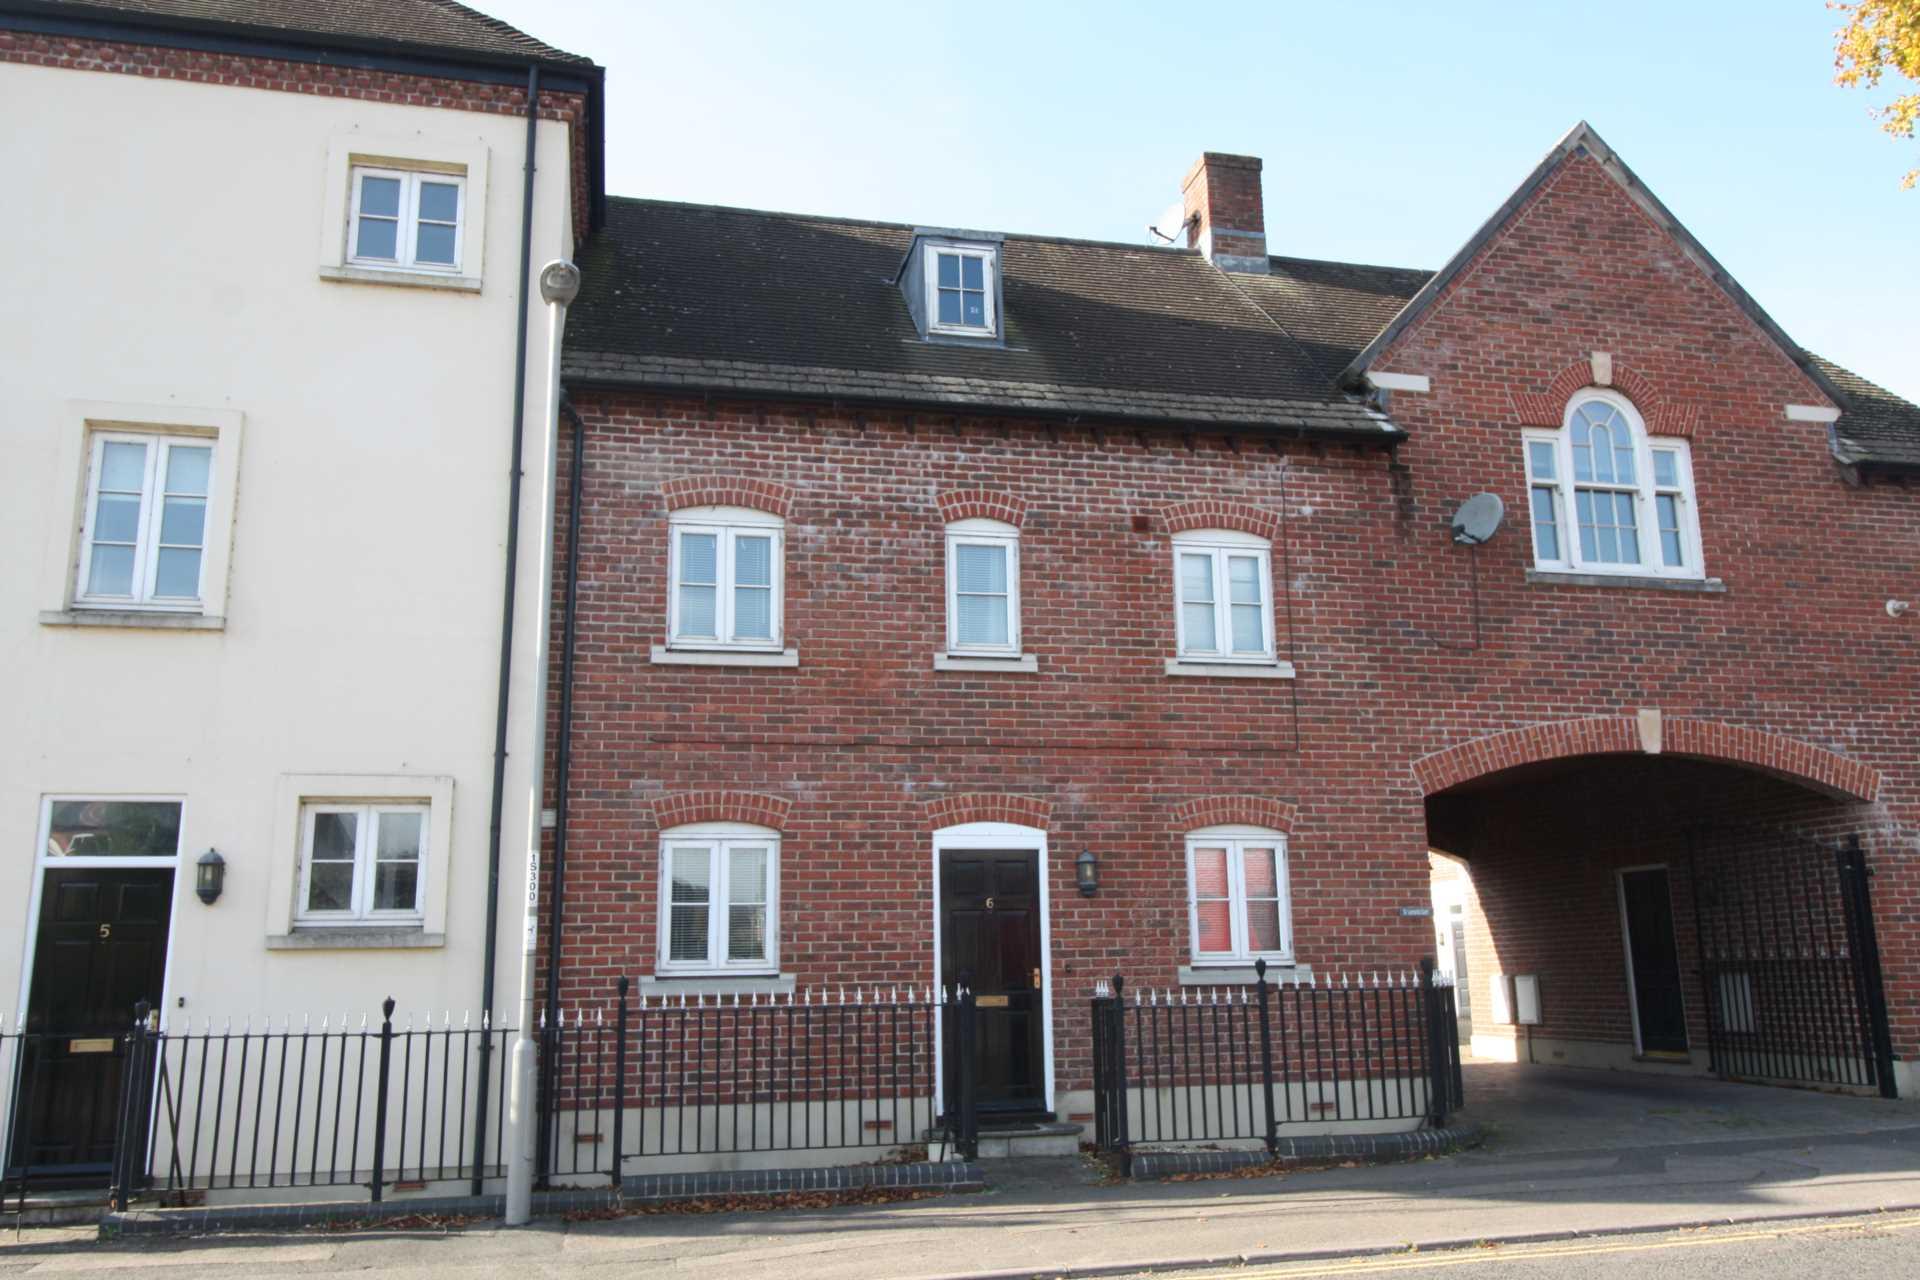 3 bed semi-detached house to rent in St. Leonards Court, St. Leonards Avenue, Blandford Forum  - Property Image 1